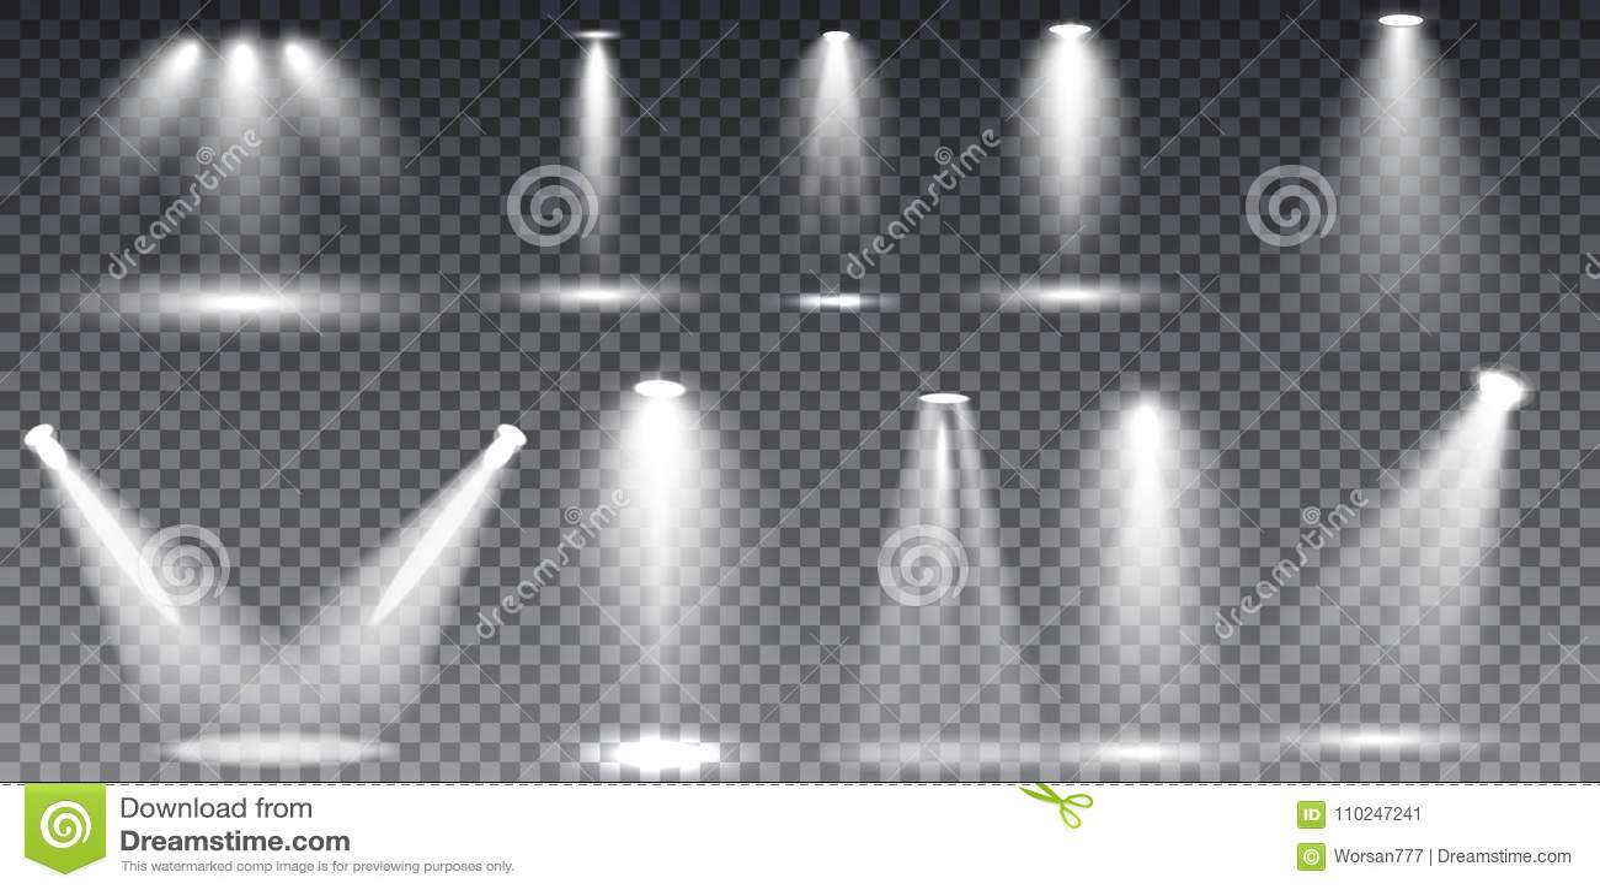 Scene illumination collection, transparent effects.